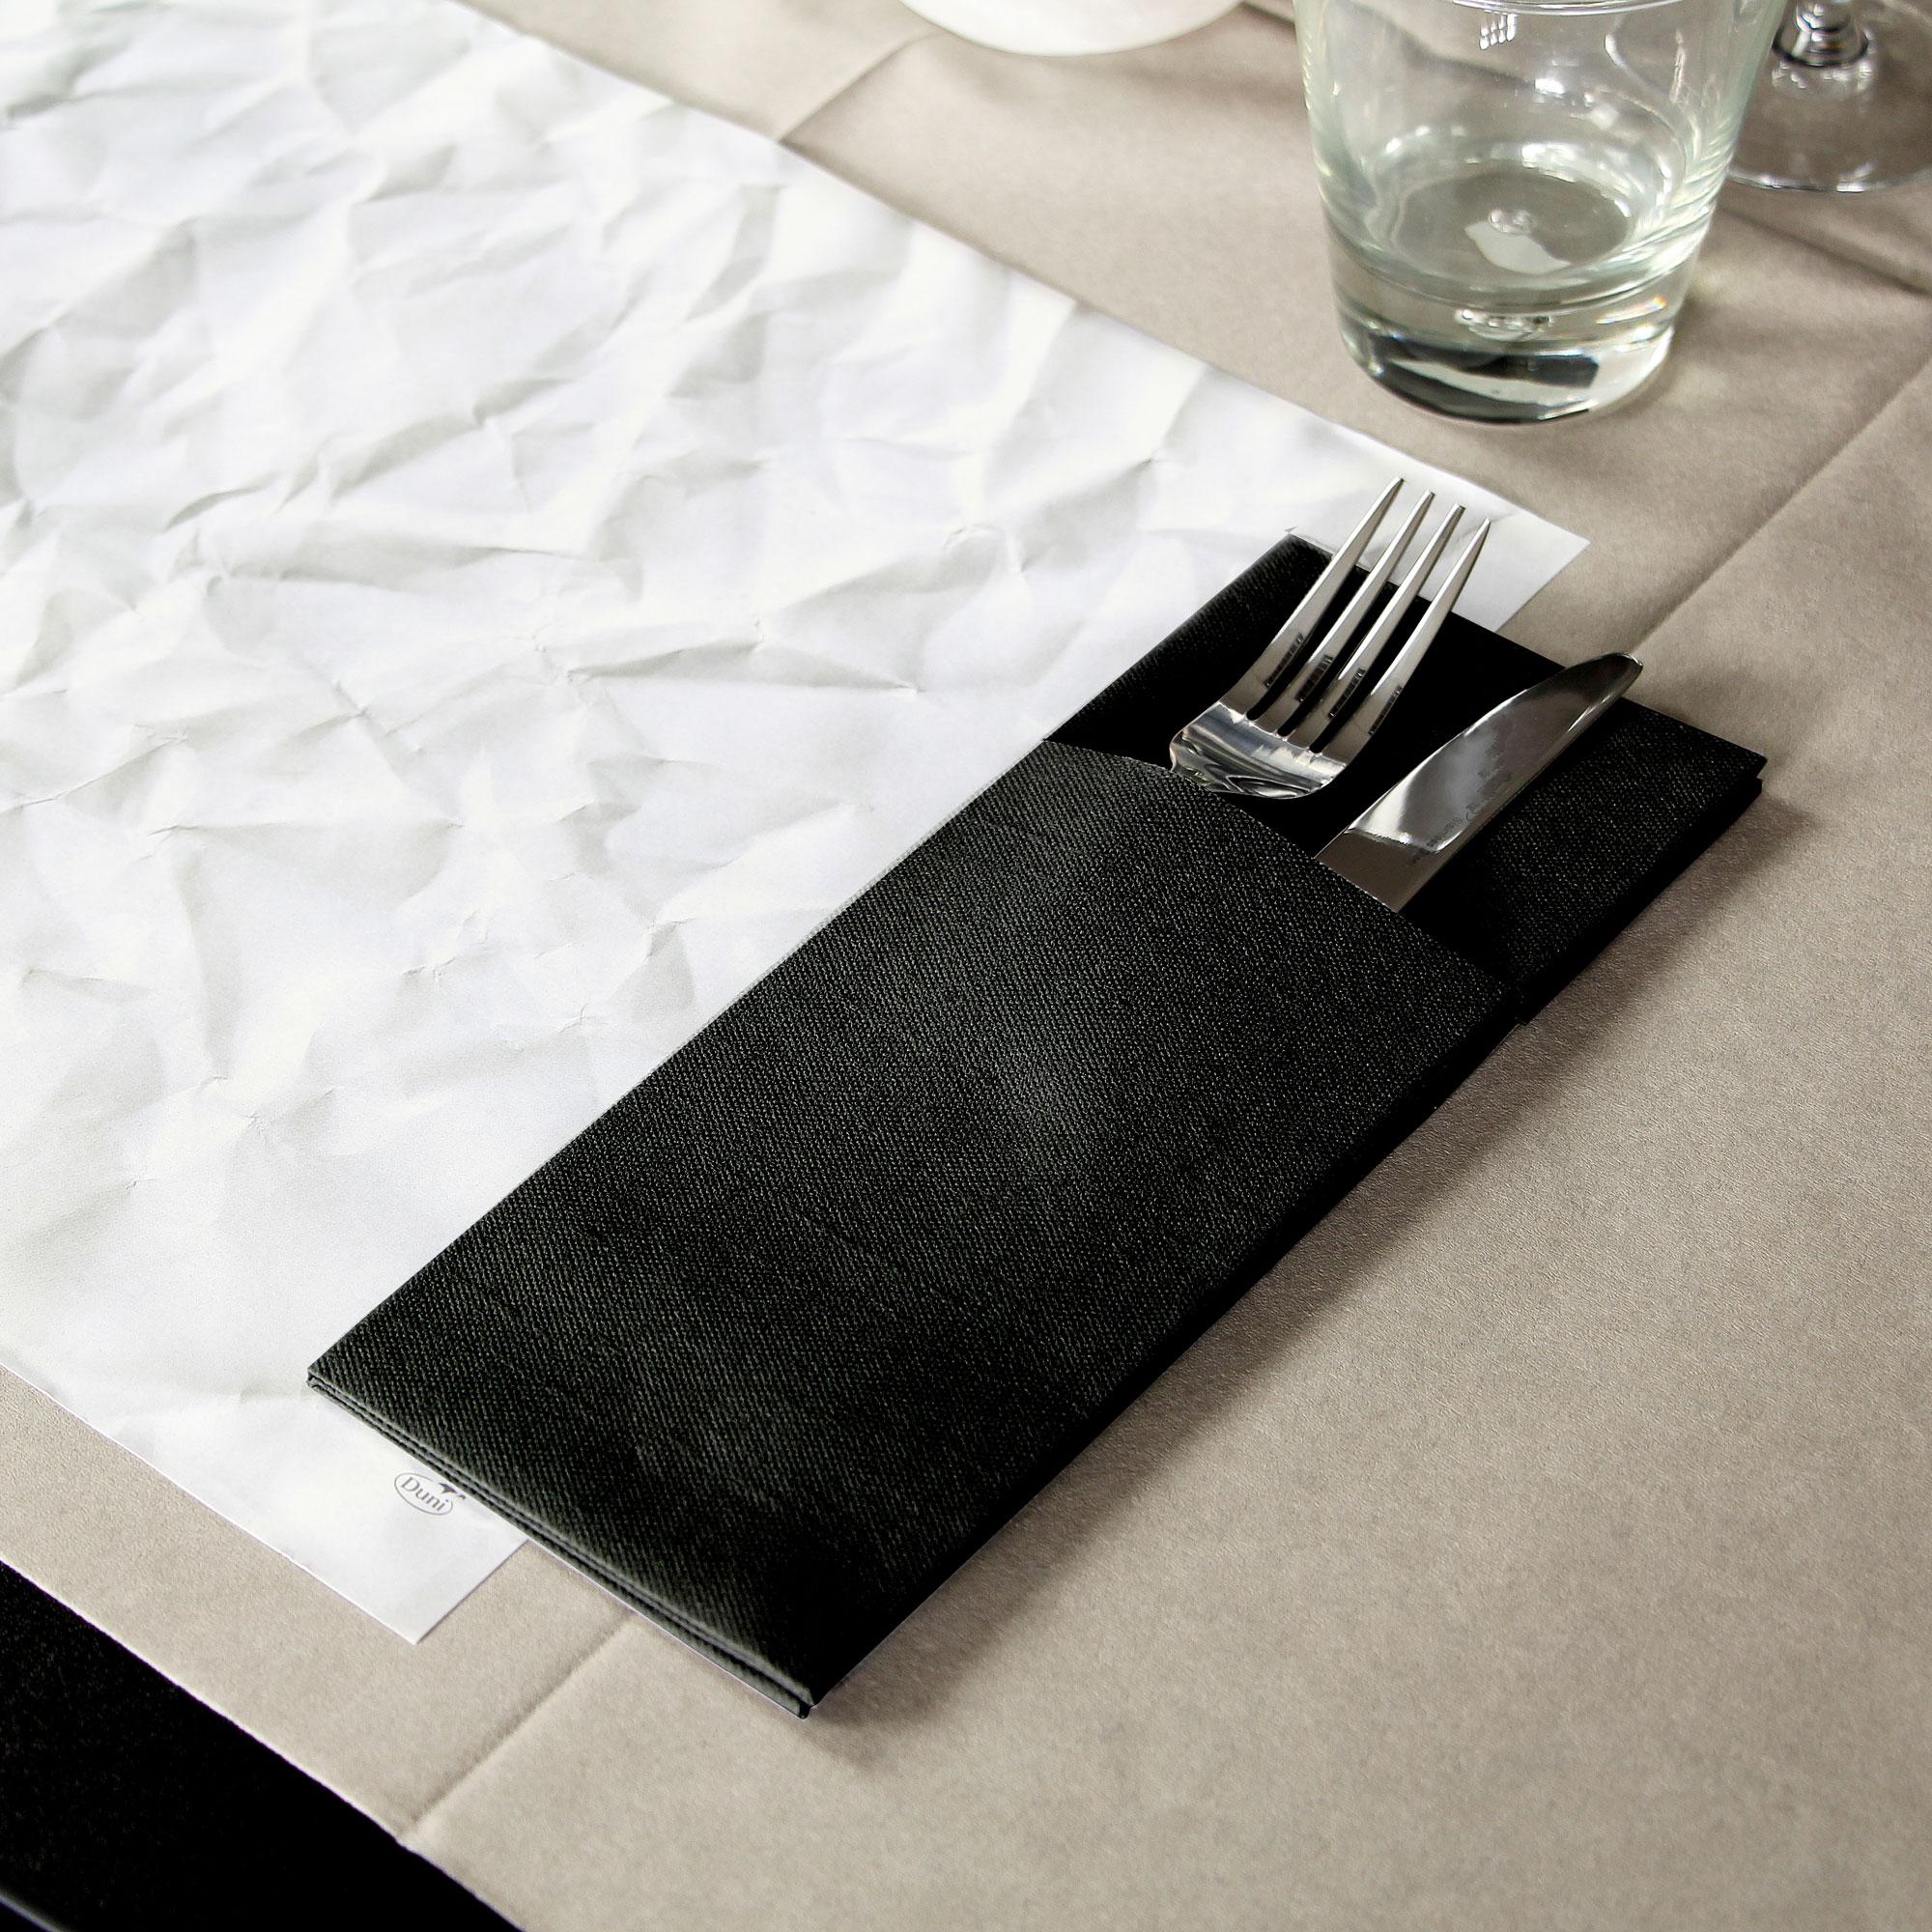 Duniletto Napkin Pockets Black 40 x 48cm & Duni Duniletto Black Napkin Pocket Cutlery Holder 40 x 48cm